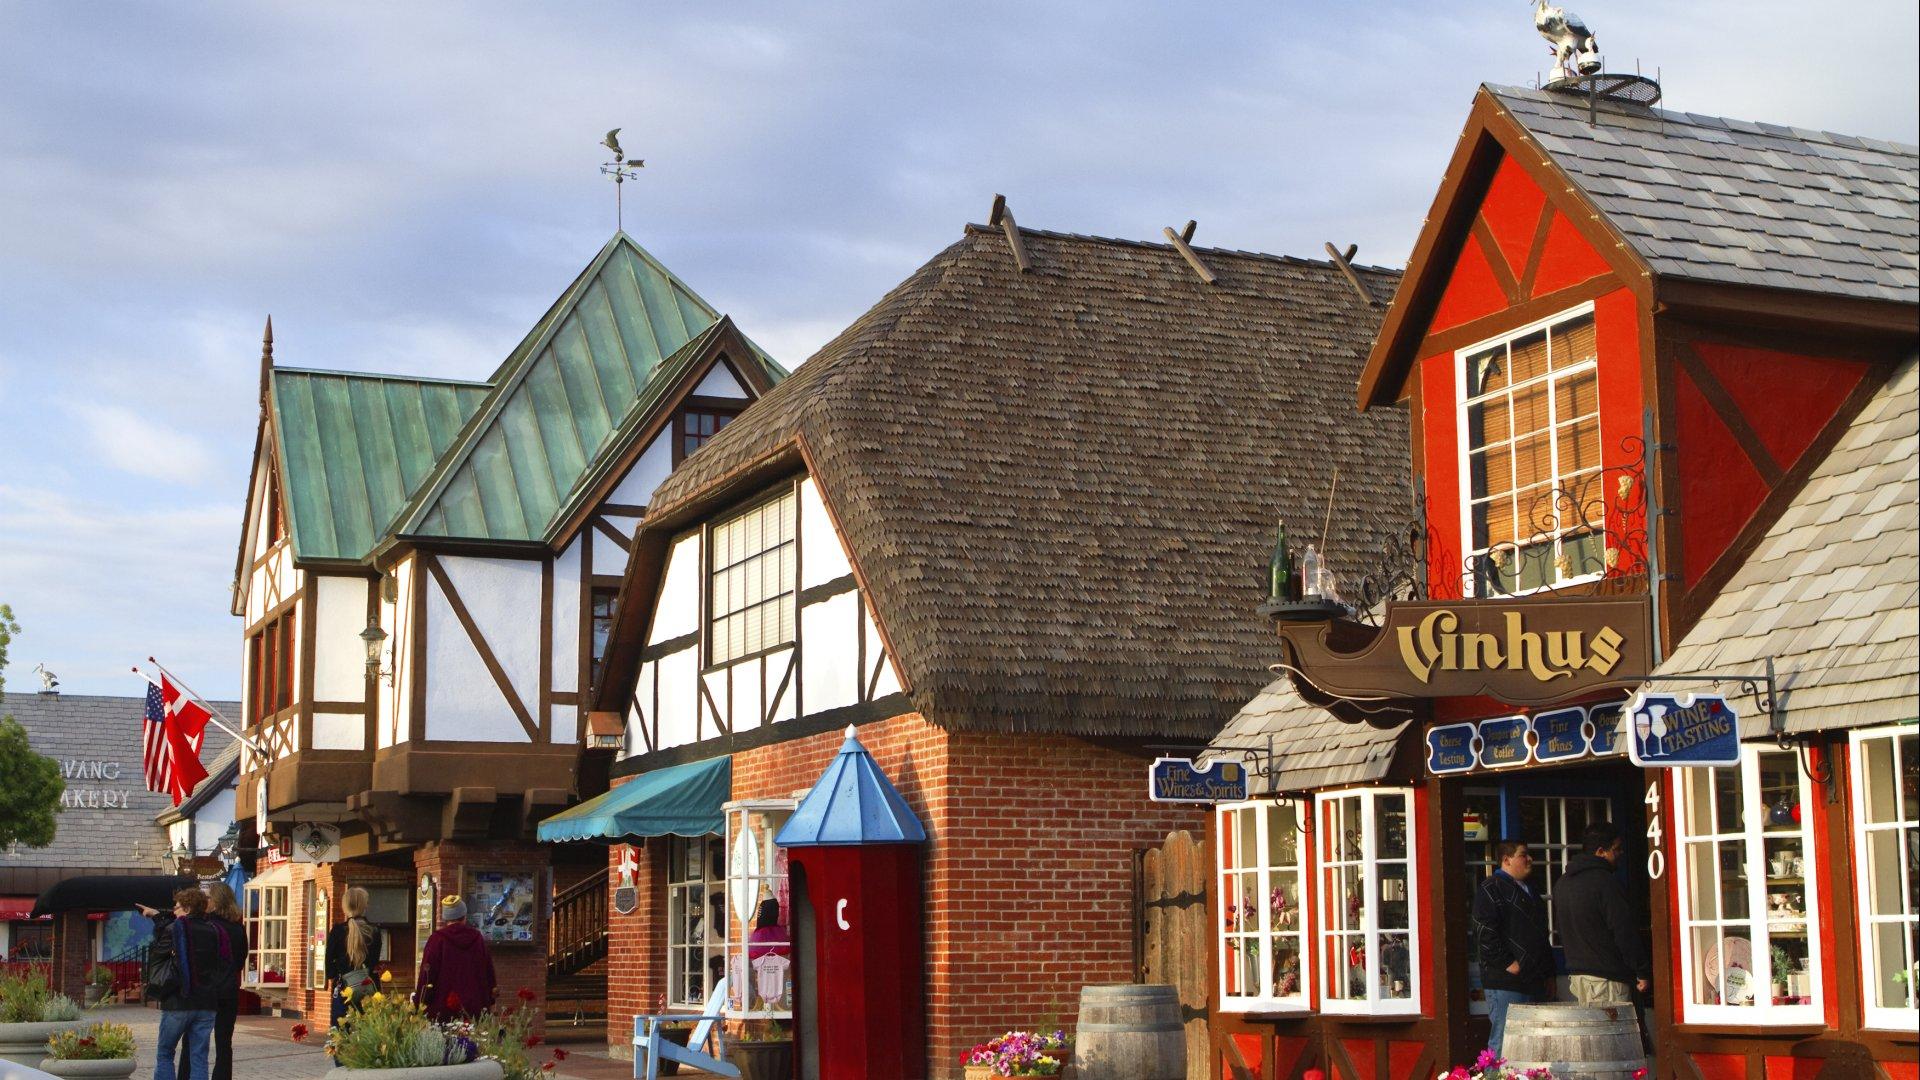 Take a Walk Through a Danish Village